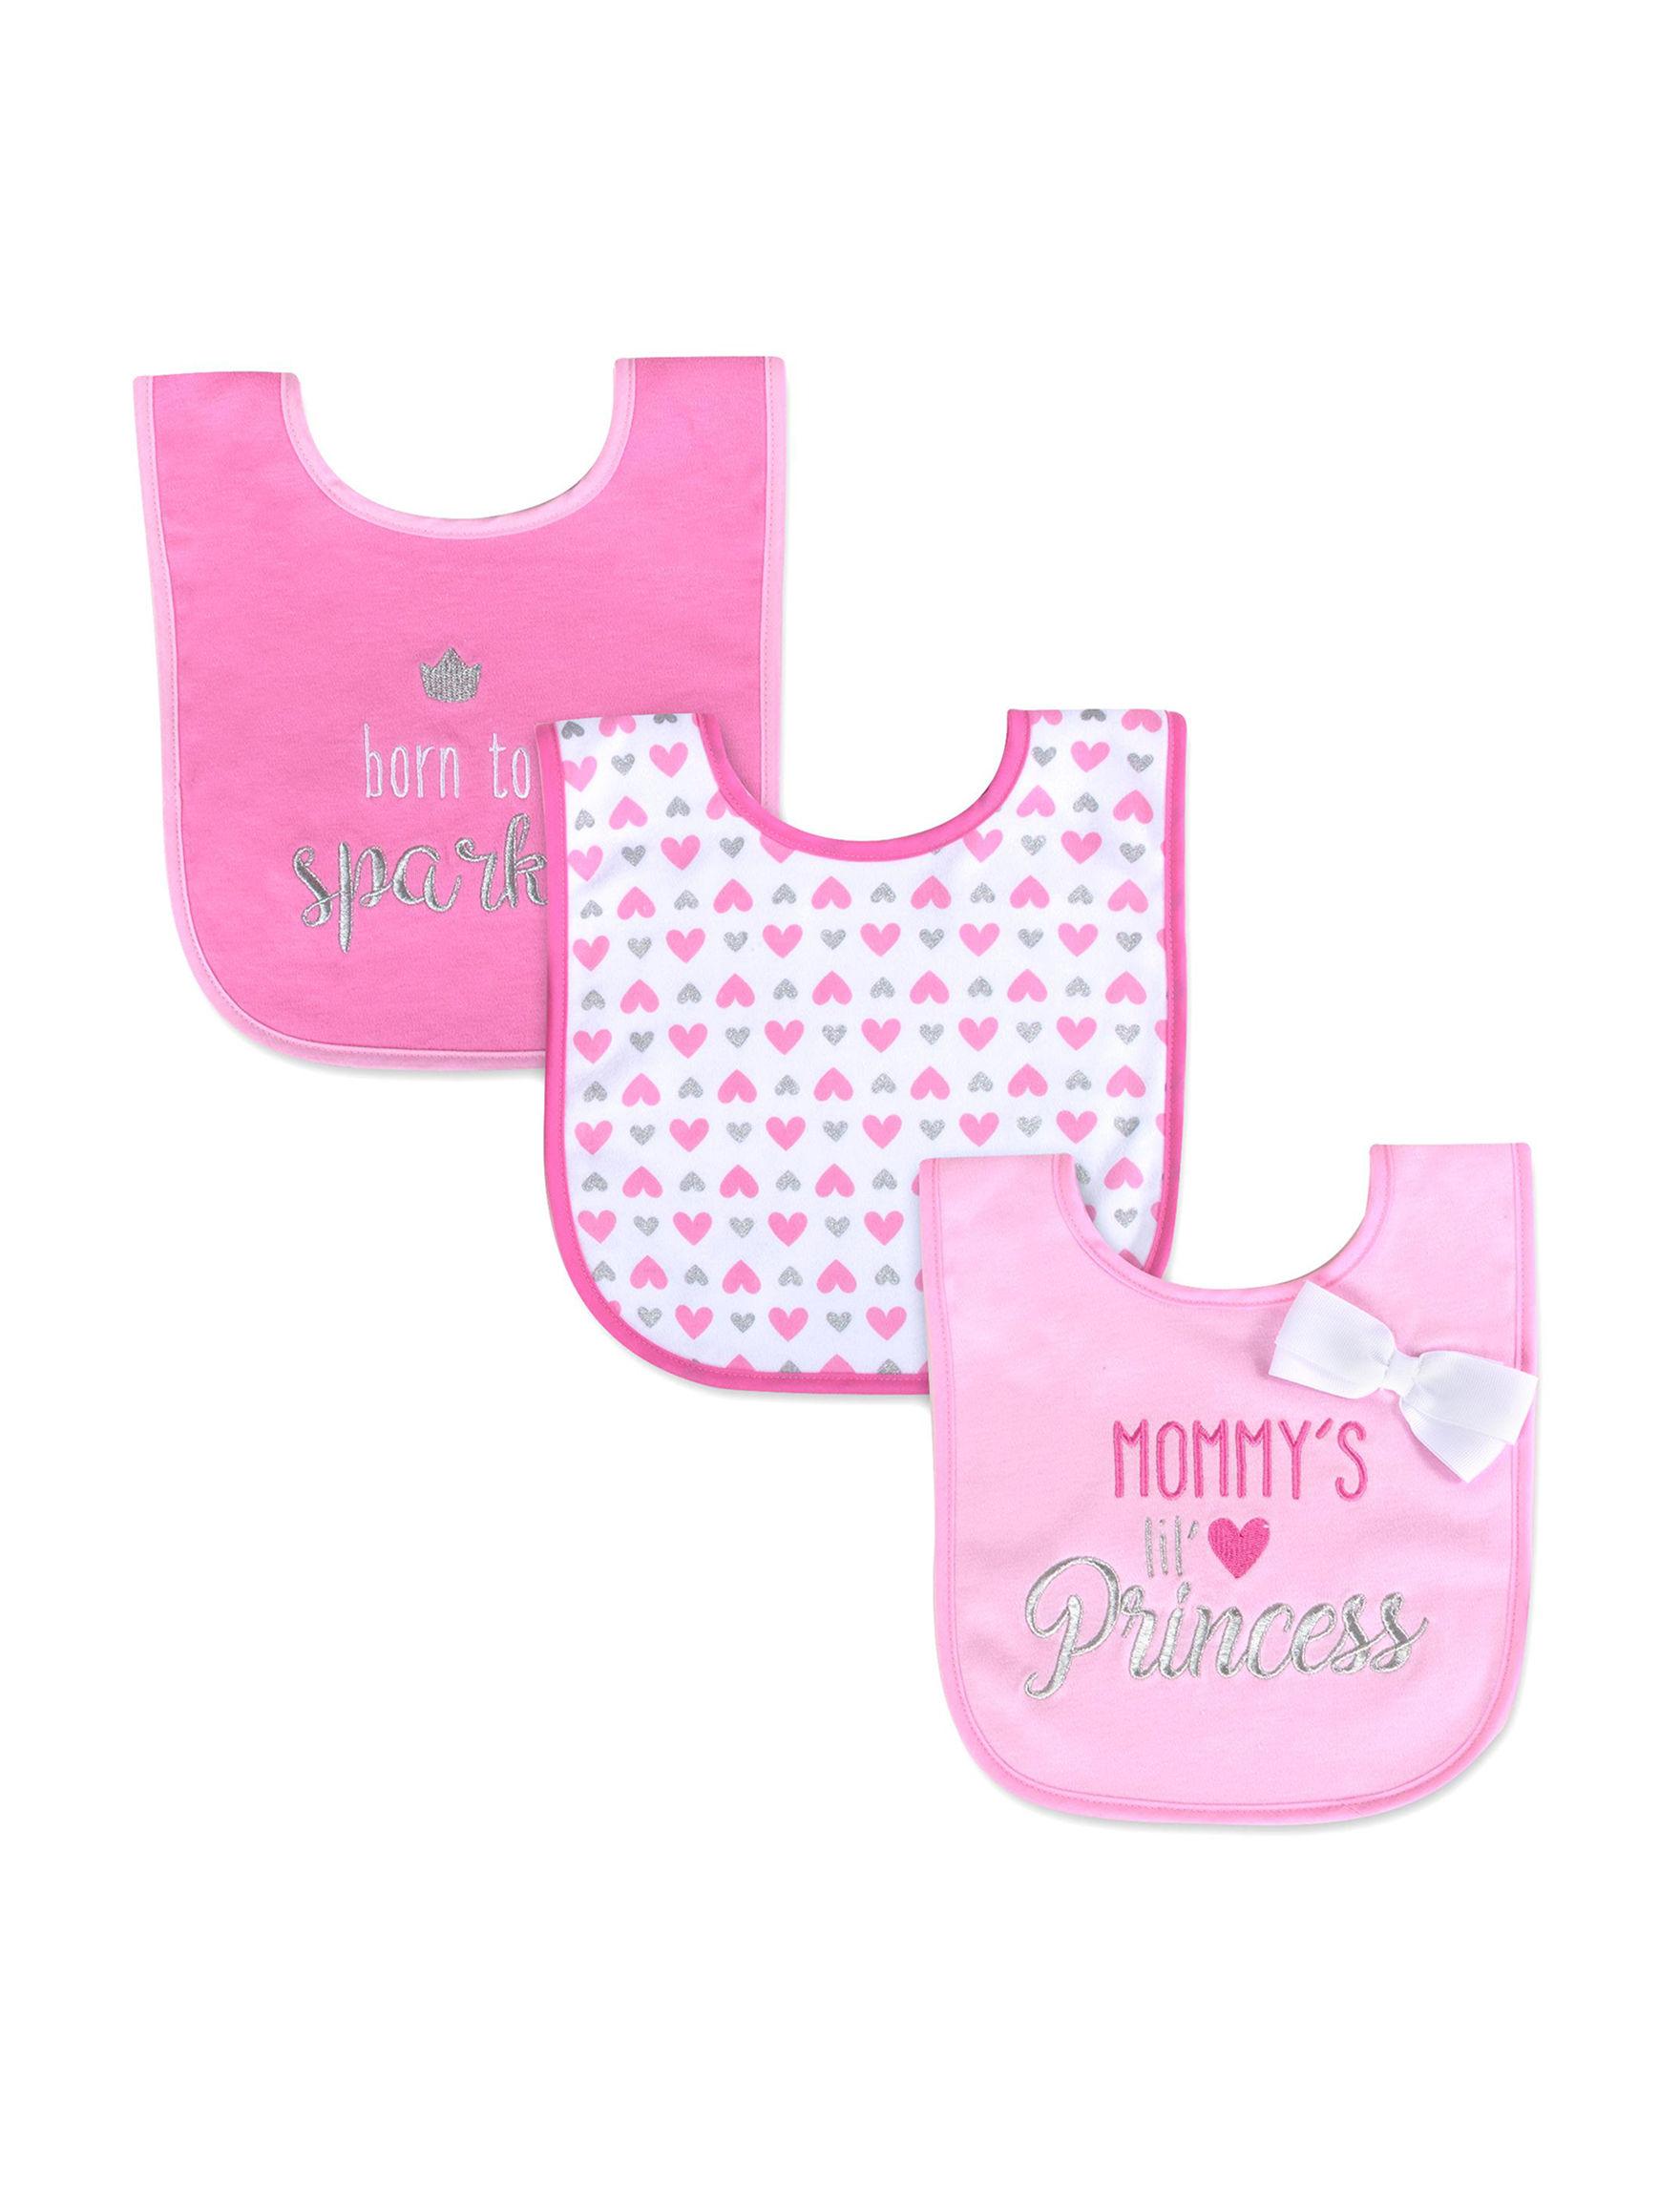 Baby Essentials Pink Bibs & Burp Cloths